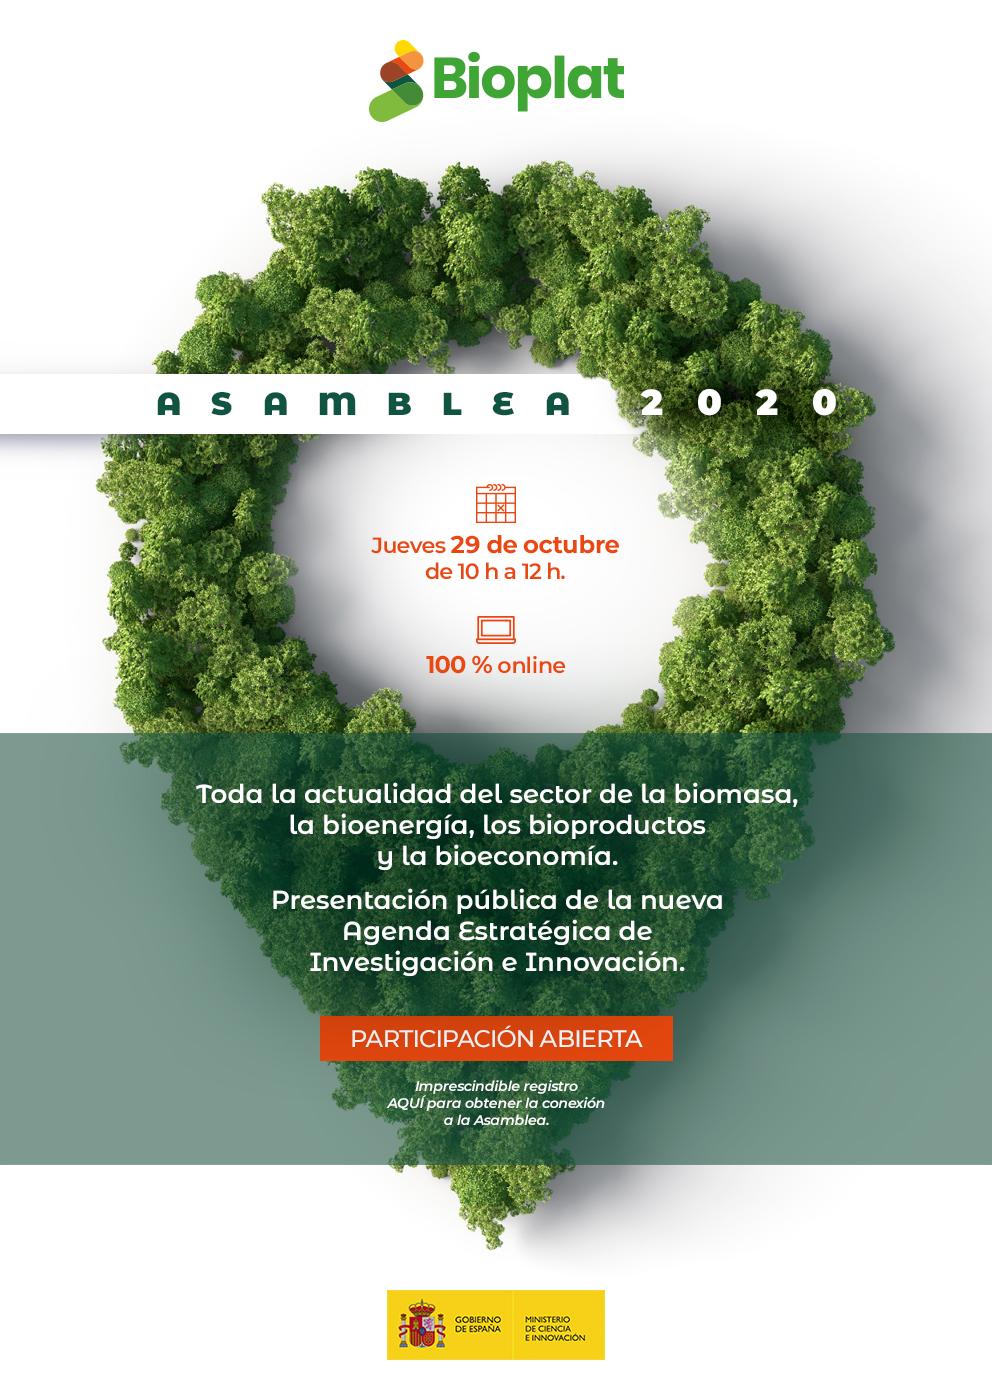 (Español) SAVE THE DATE: ASAMBLEA 2020 BIOPLAT (29 OCTUBRE | 10H | ONLINE)